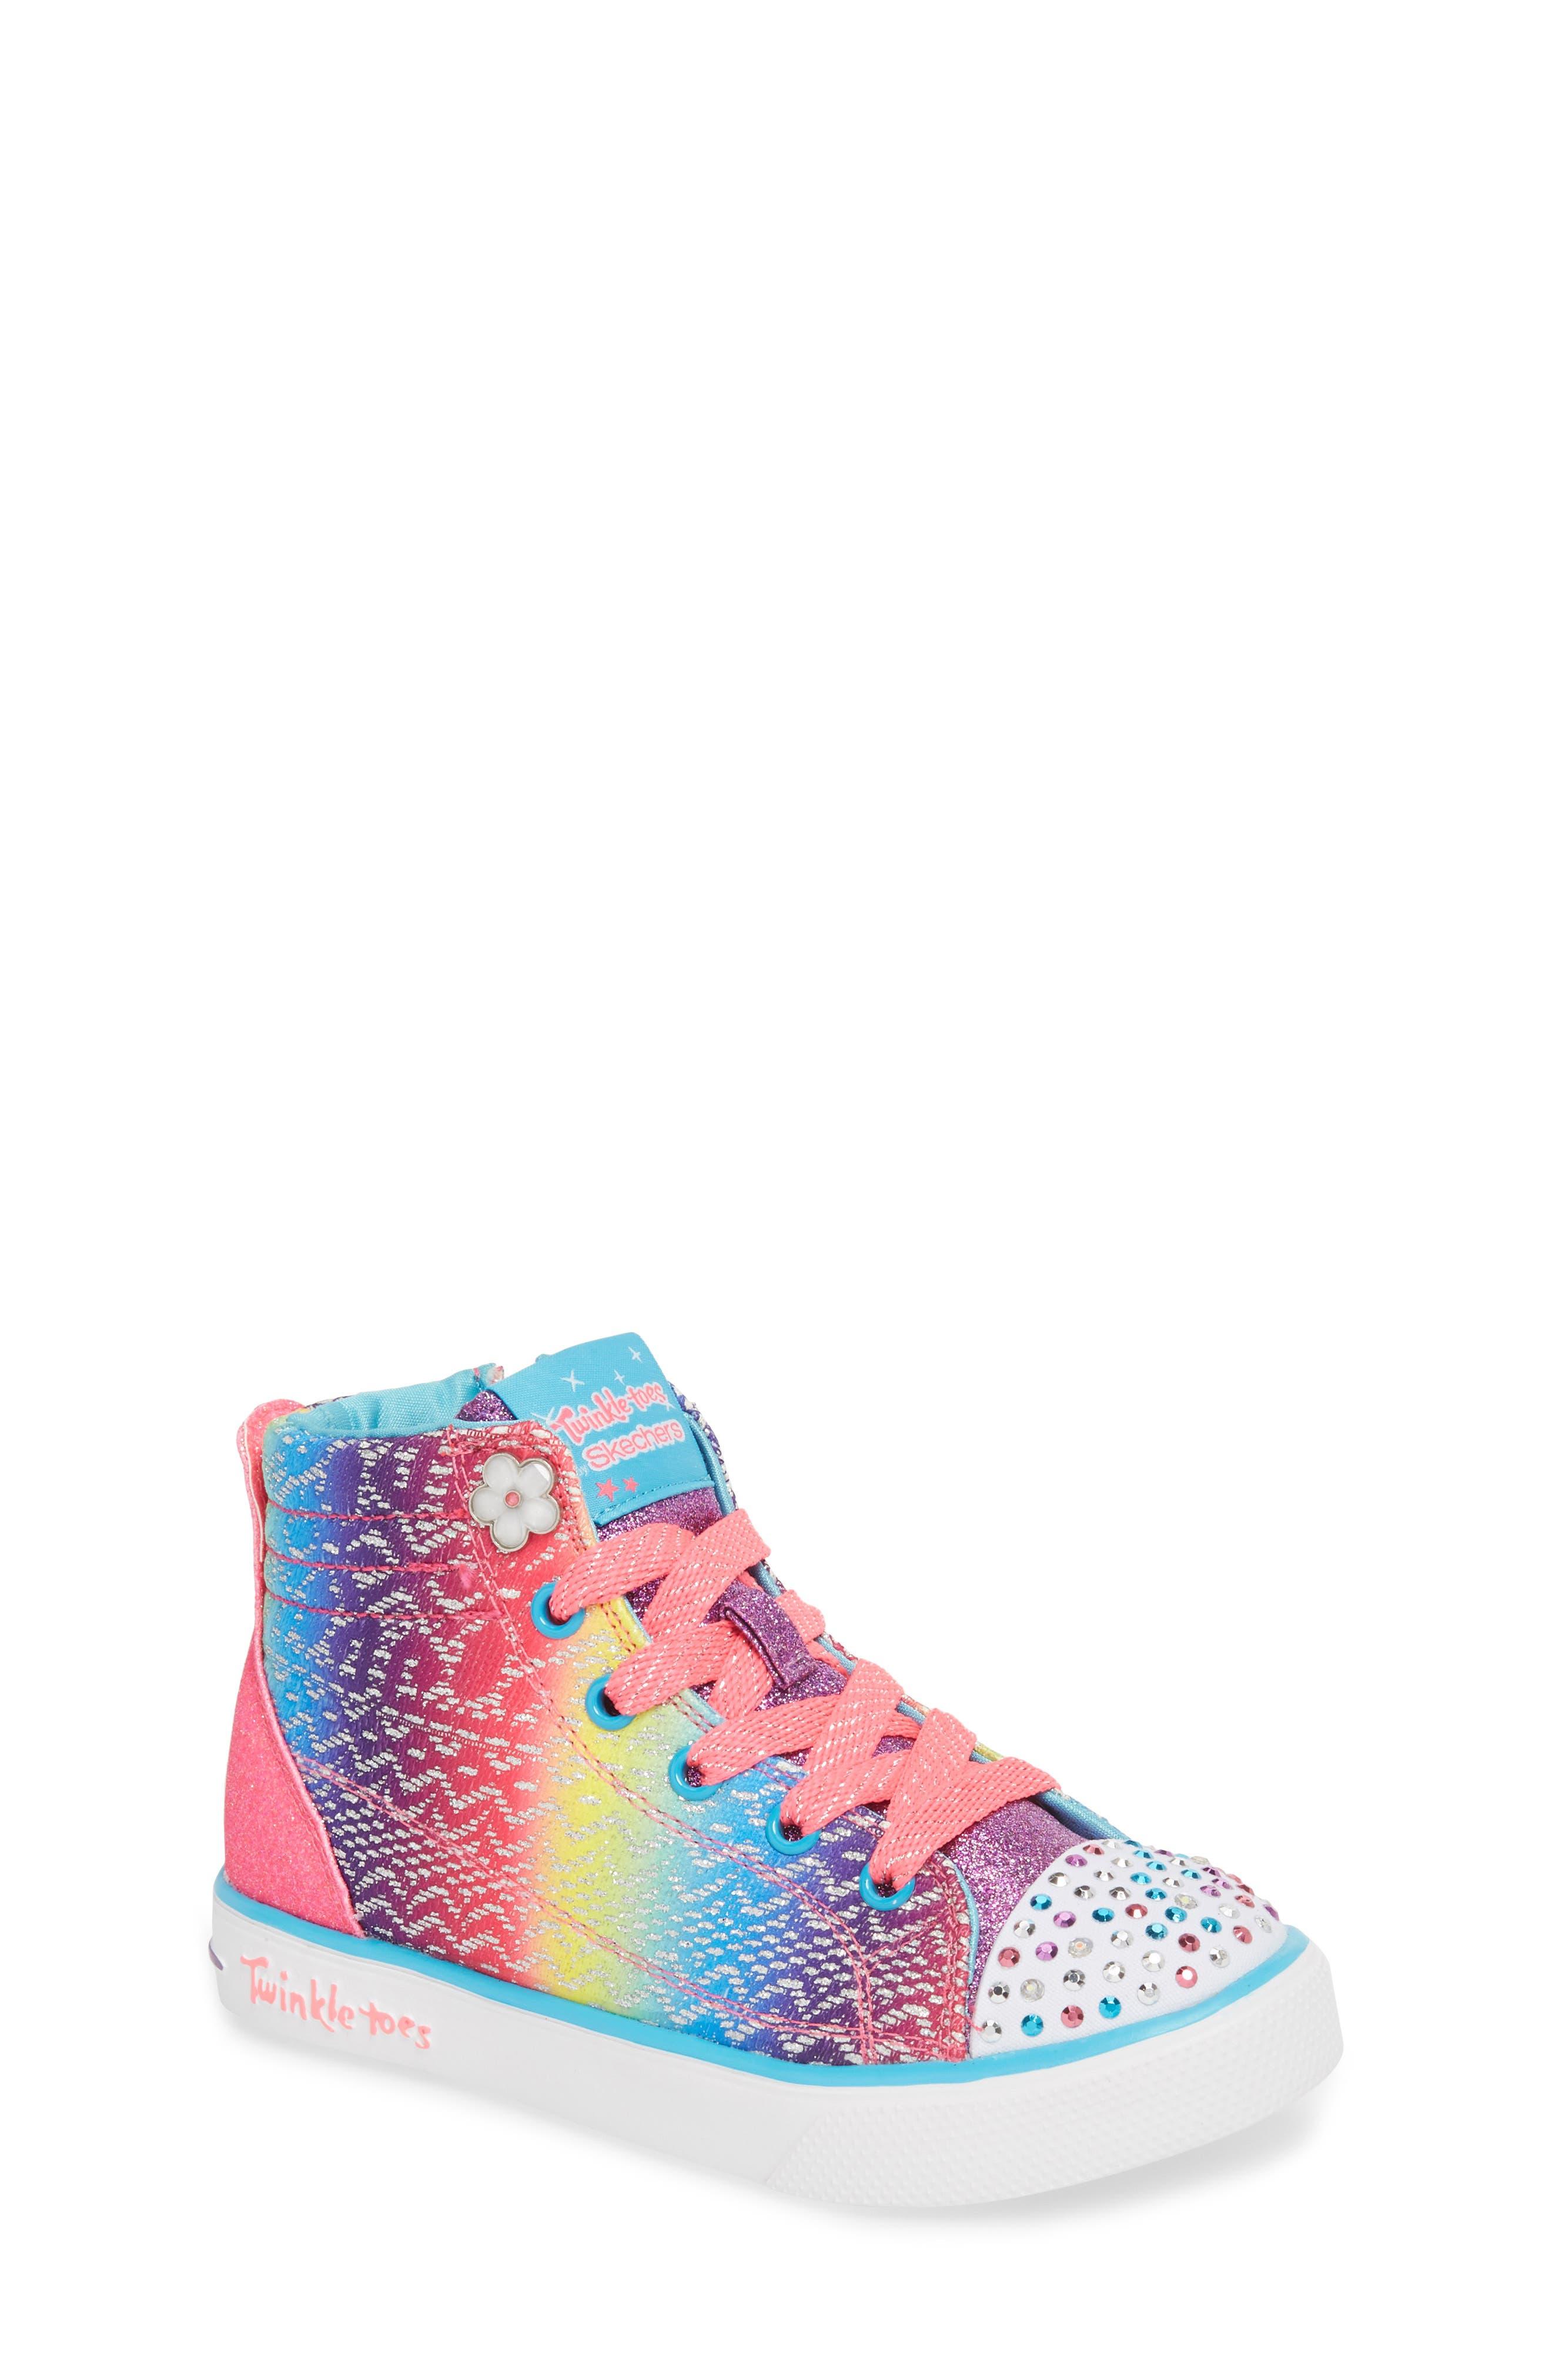 Main Image - SKECHERS Twinkle Toes Breeze 2.0 Light-Up High Top Sneaker (Toddler, Little Kid & Big Kid)